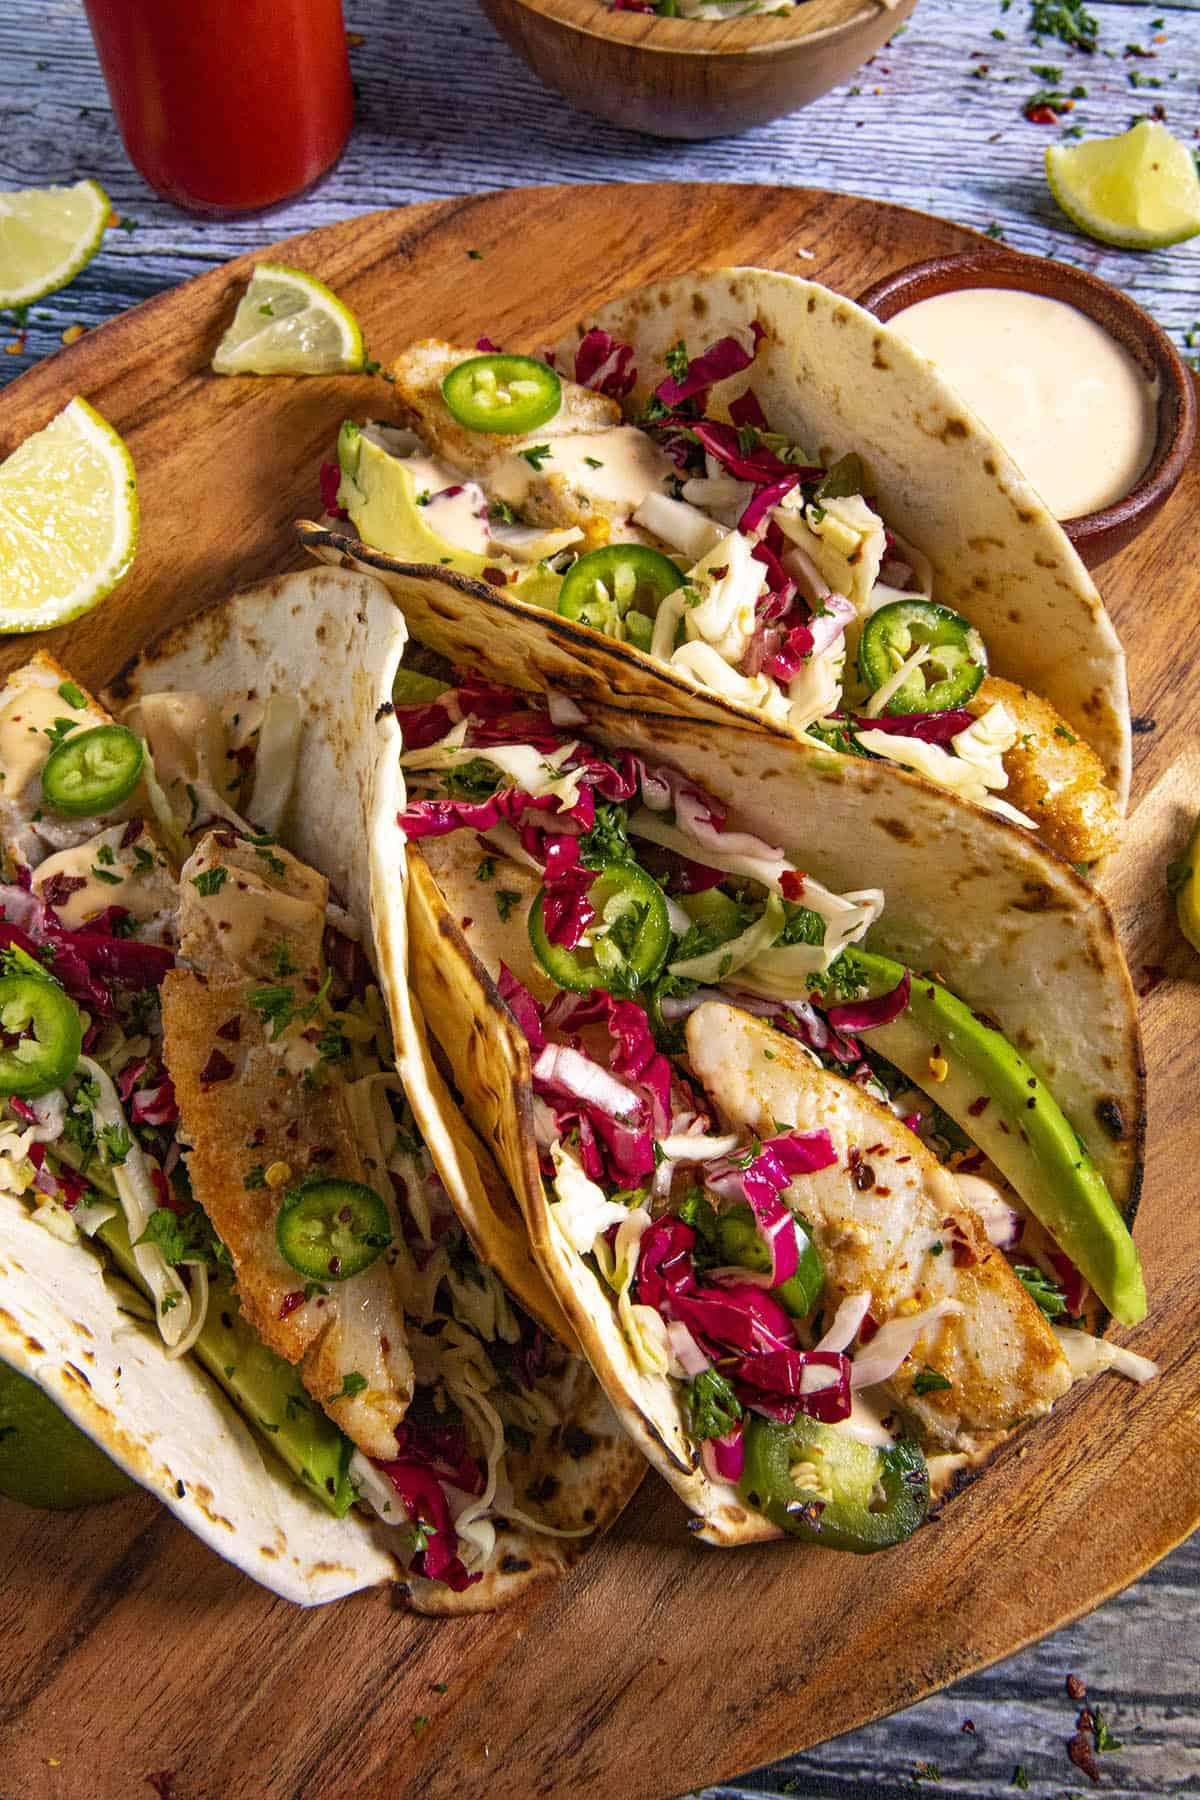 3 Fish tacos with crunchy slaw, avocado and creamy fish taco sauce